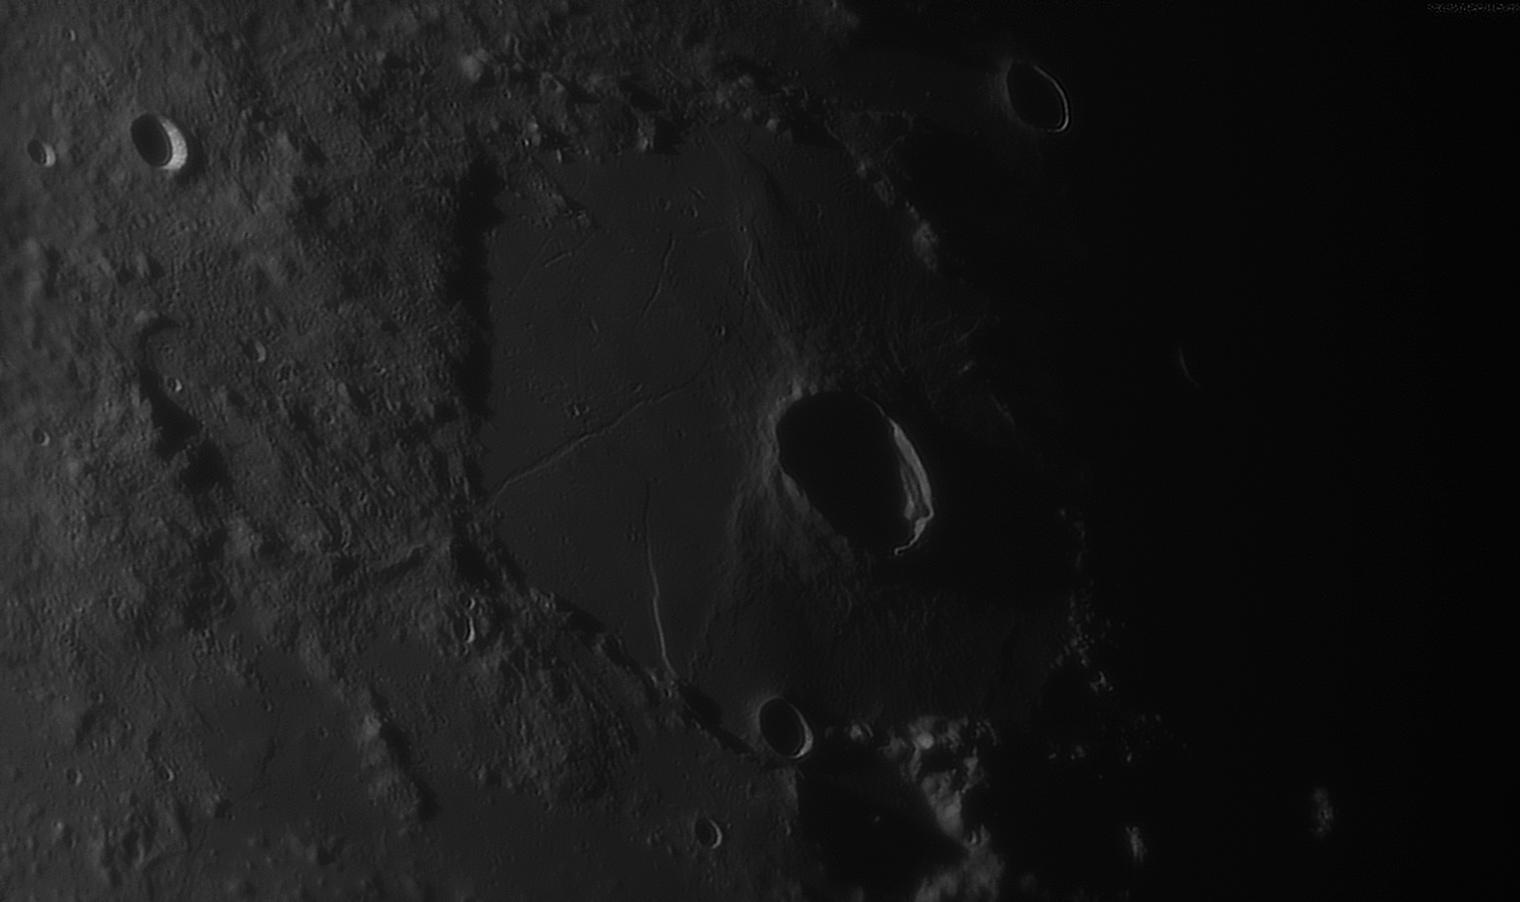 large.moon_19_09_2019_01_50_21_-L.jpg.9dd00c46d2e552fe31061892e29fd6c5.jpg